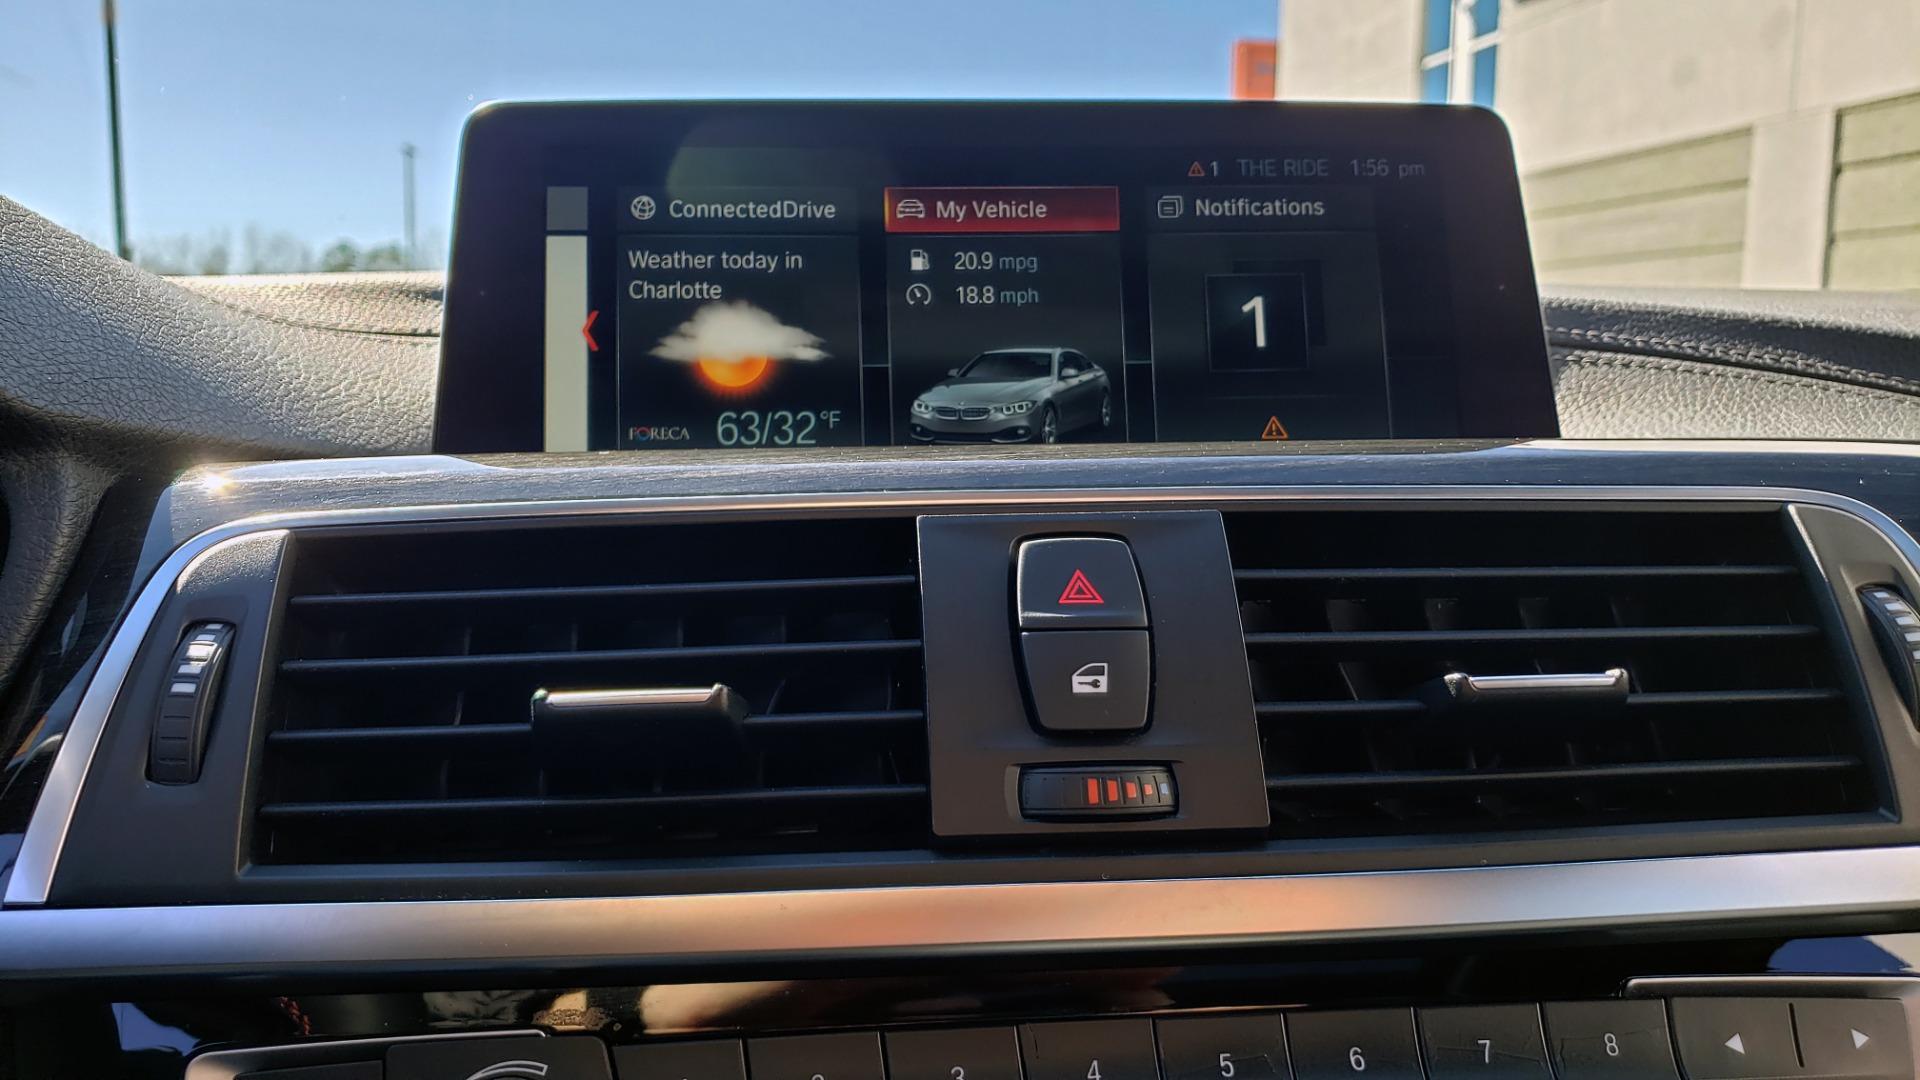 Used 2018 BMW 4 SERIES 430IXDRIVE / PREMIUM / NAV / SUNROOF / ESSENTIALS PKG for sale $27,795 at Formula Imports in Charlotte NC 28227 47